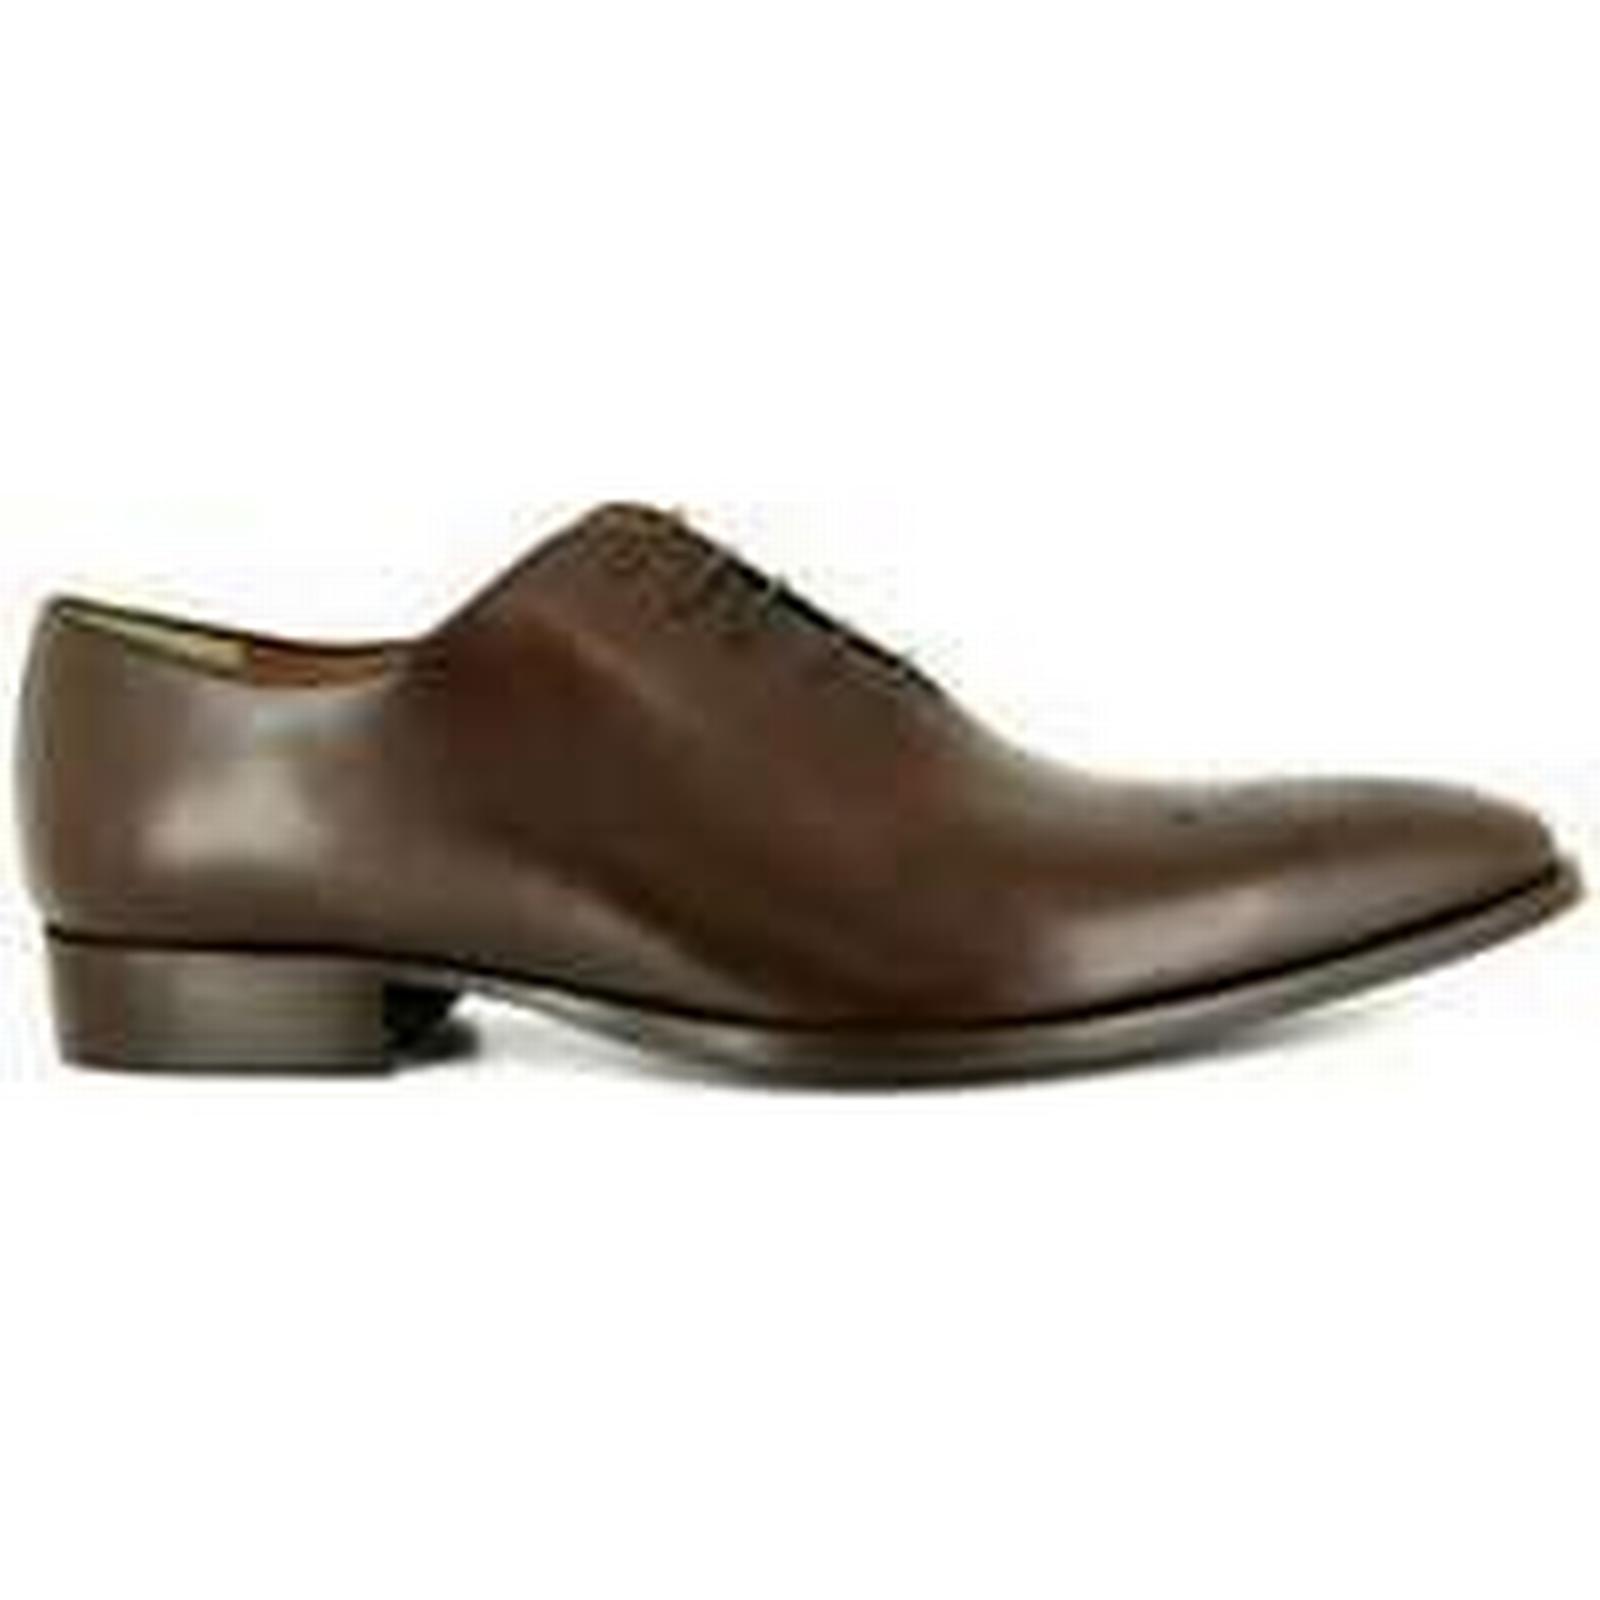 homme Marron des chaussures en cuir hommes richelieu jb-dalmas hommes cuir cc520a